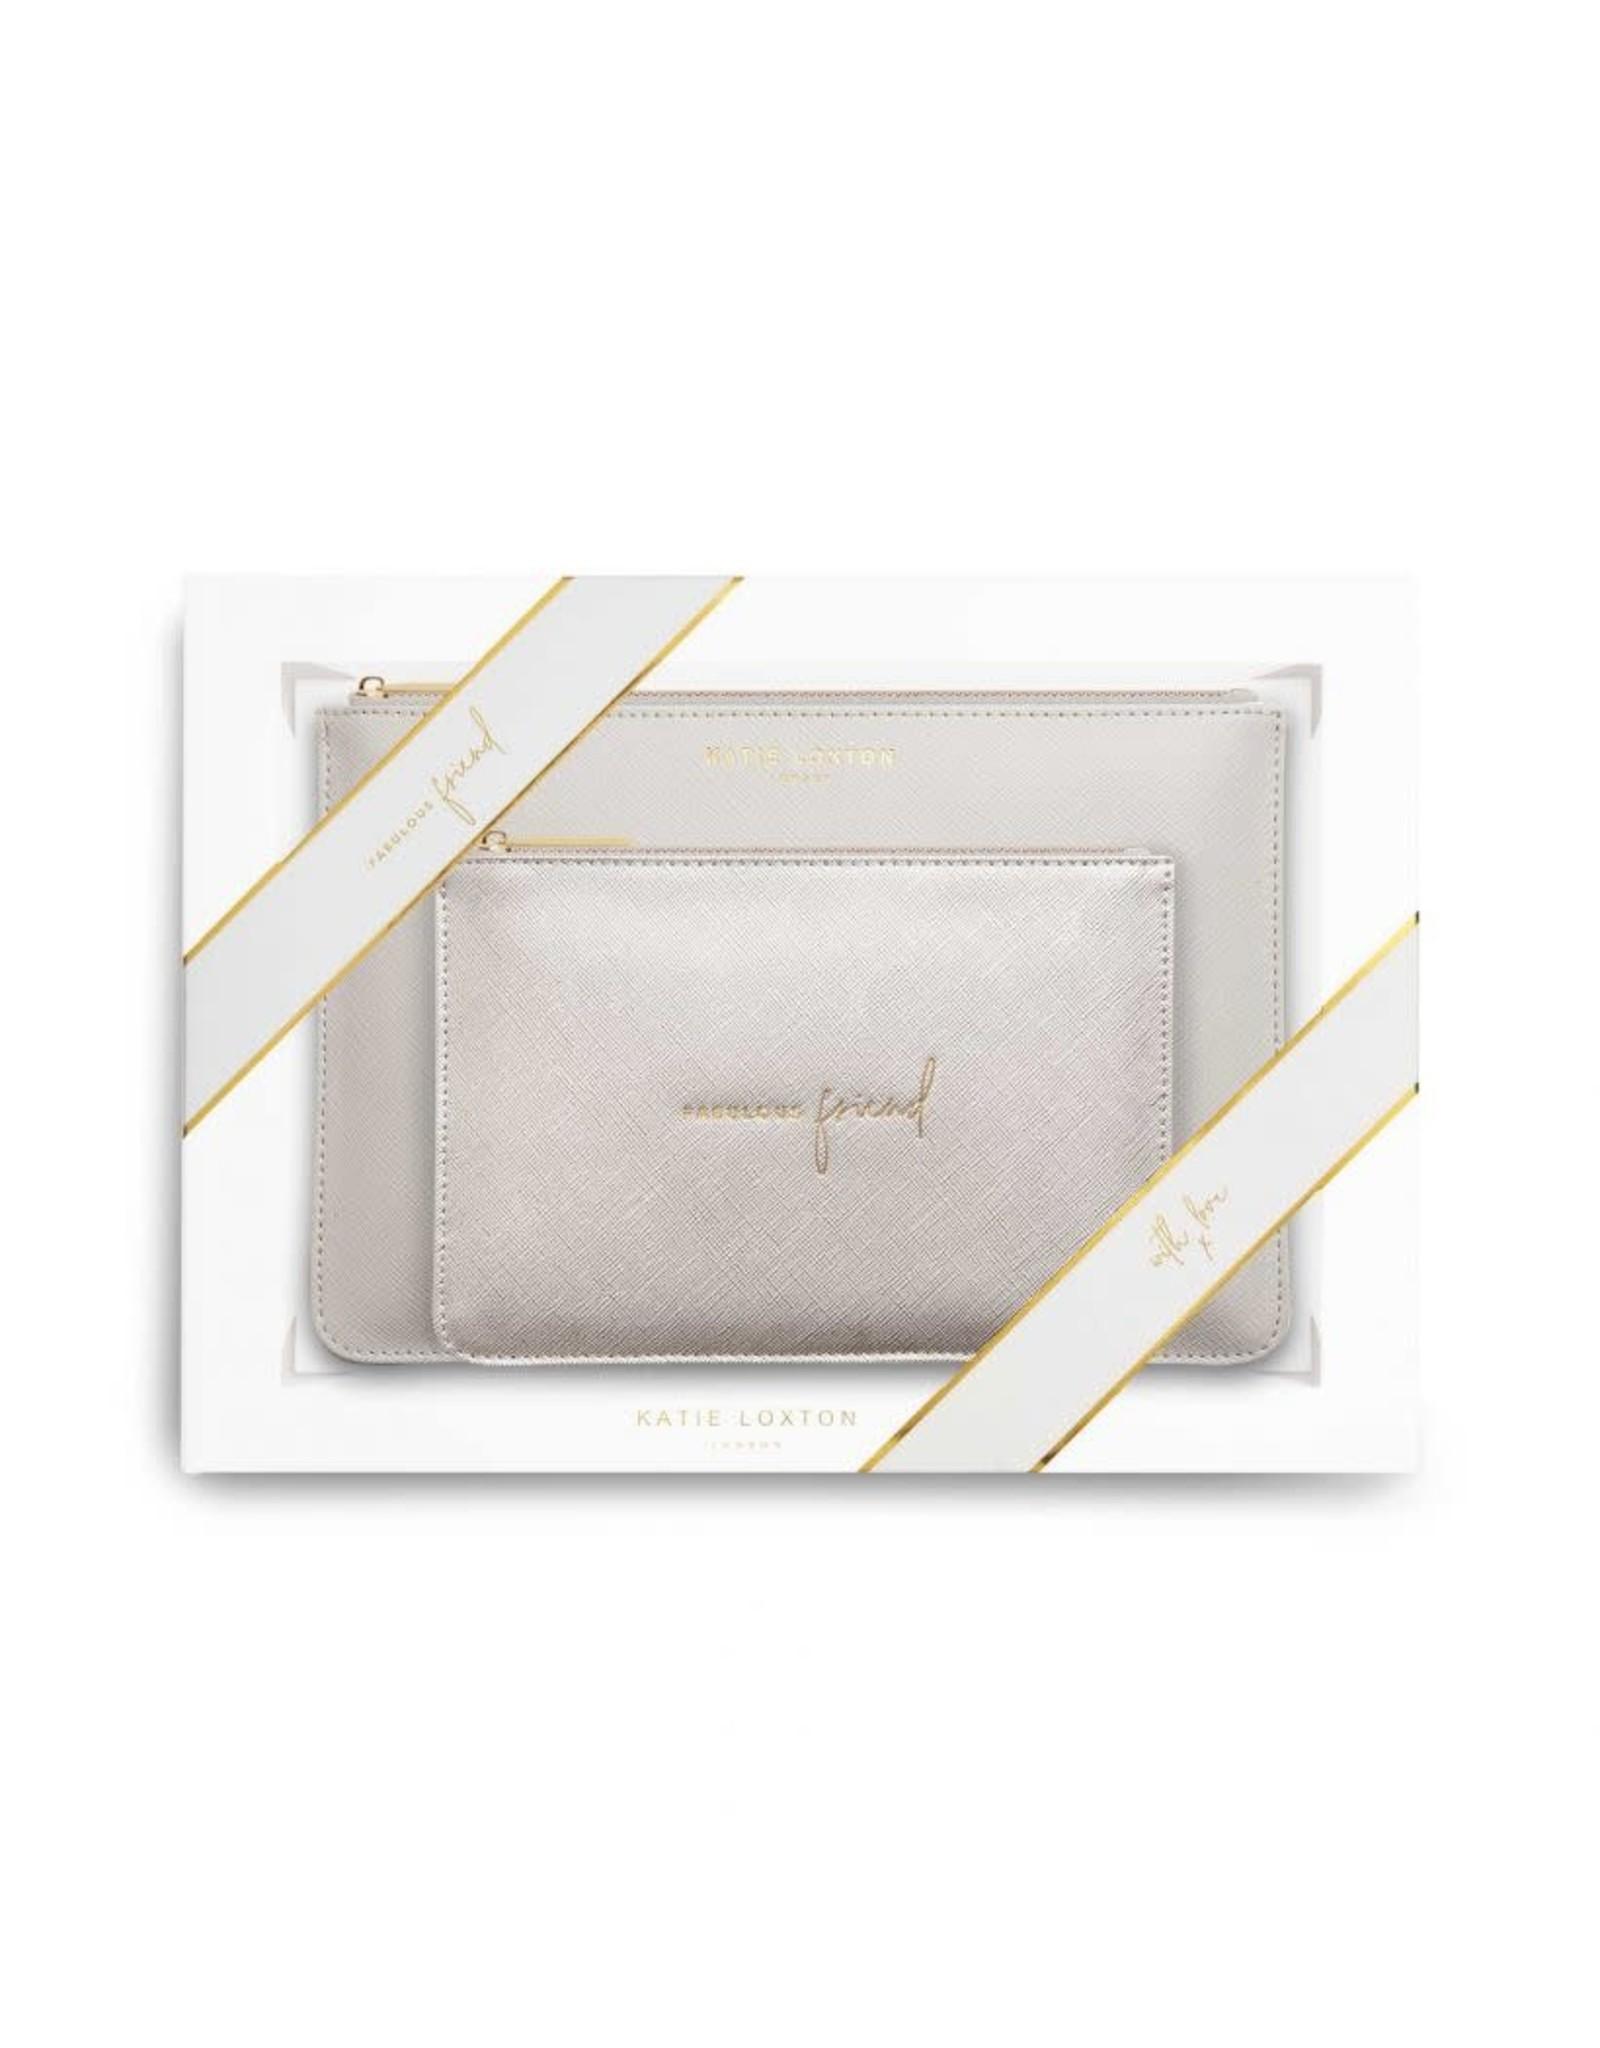 Katie Loxton Perfect Pouch Giftset - Fabulous Friend